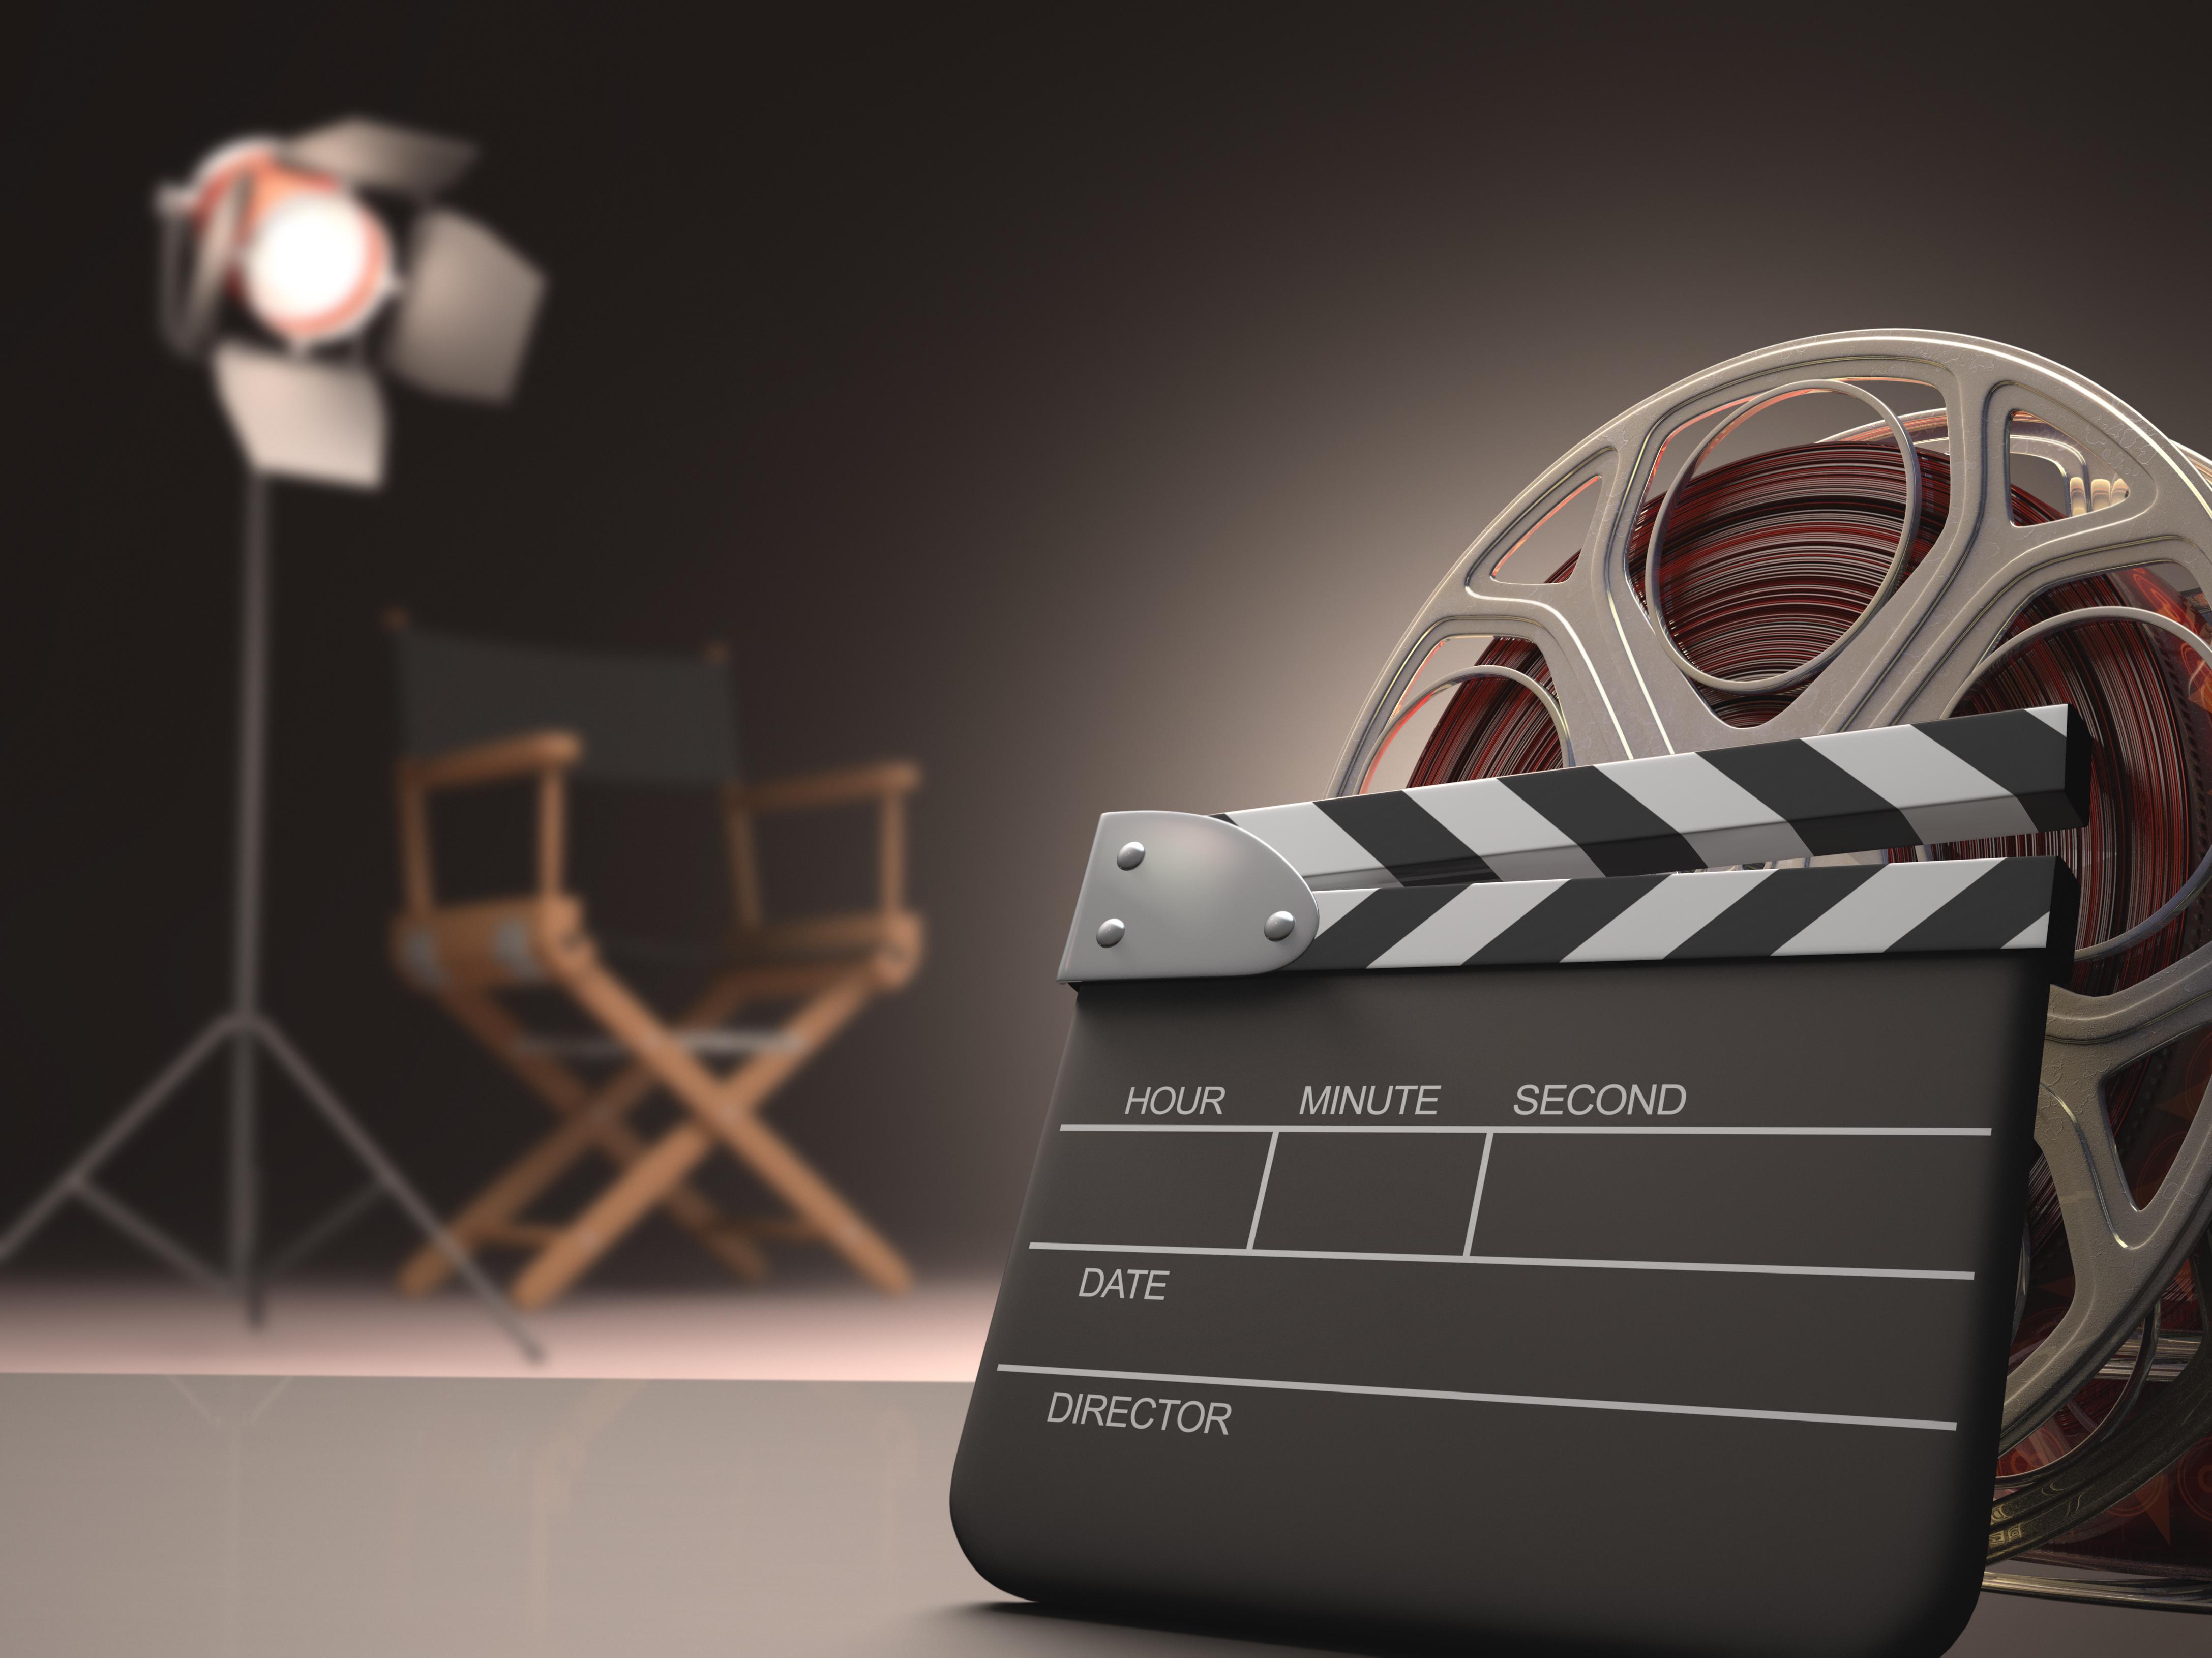 clapboard-cinema-entertainment-PRHHS7E.j